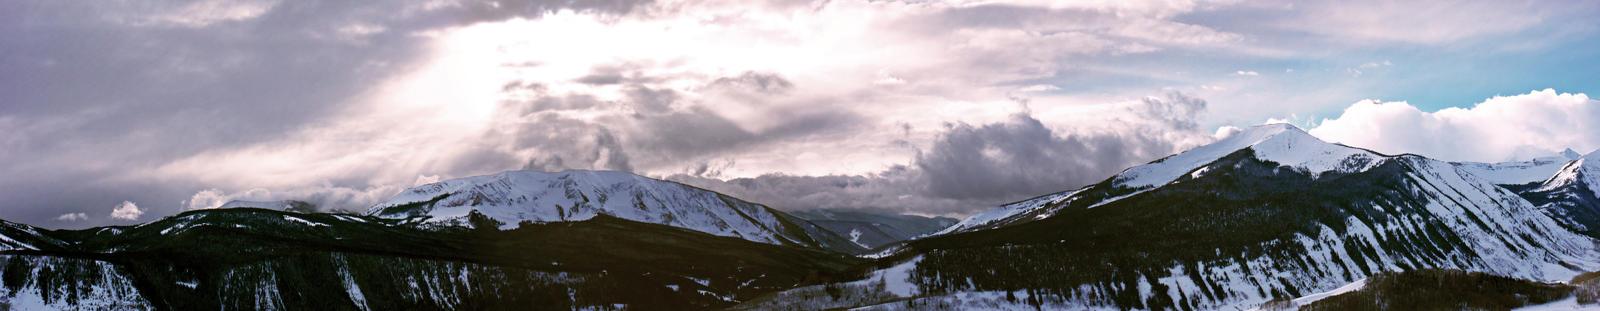 Mountain Sky by Achmetha